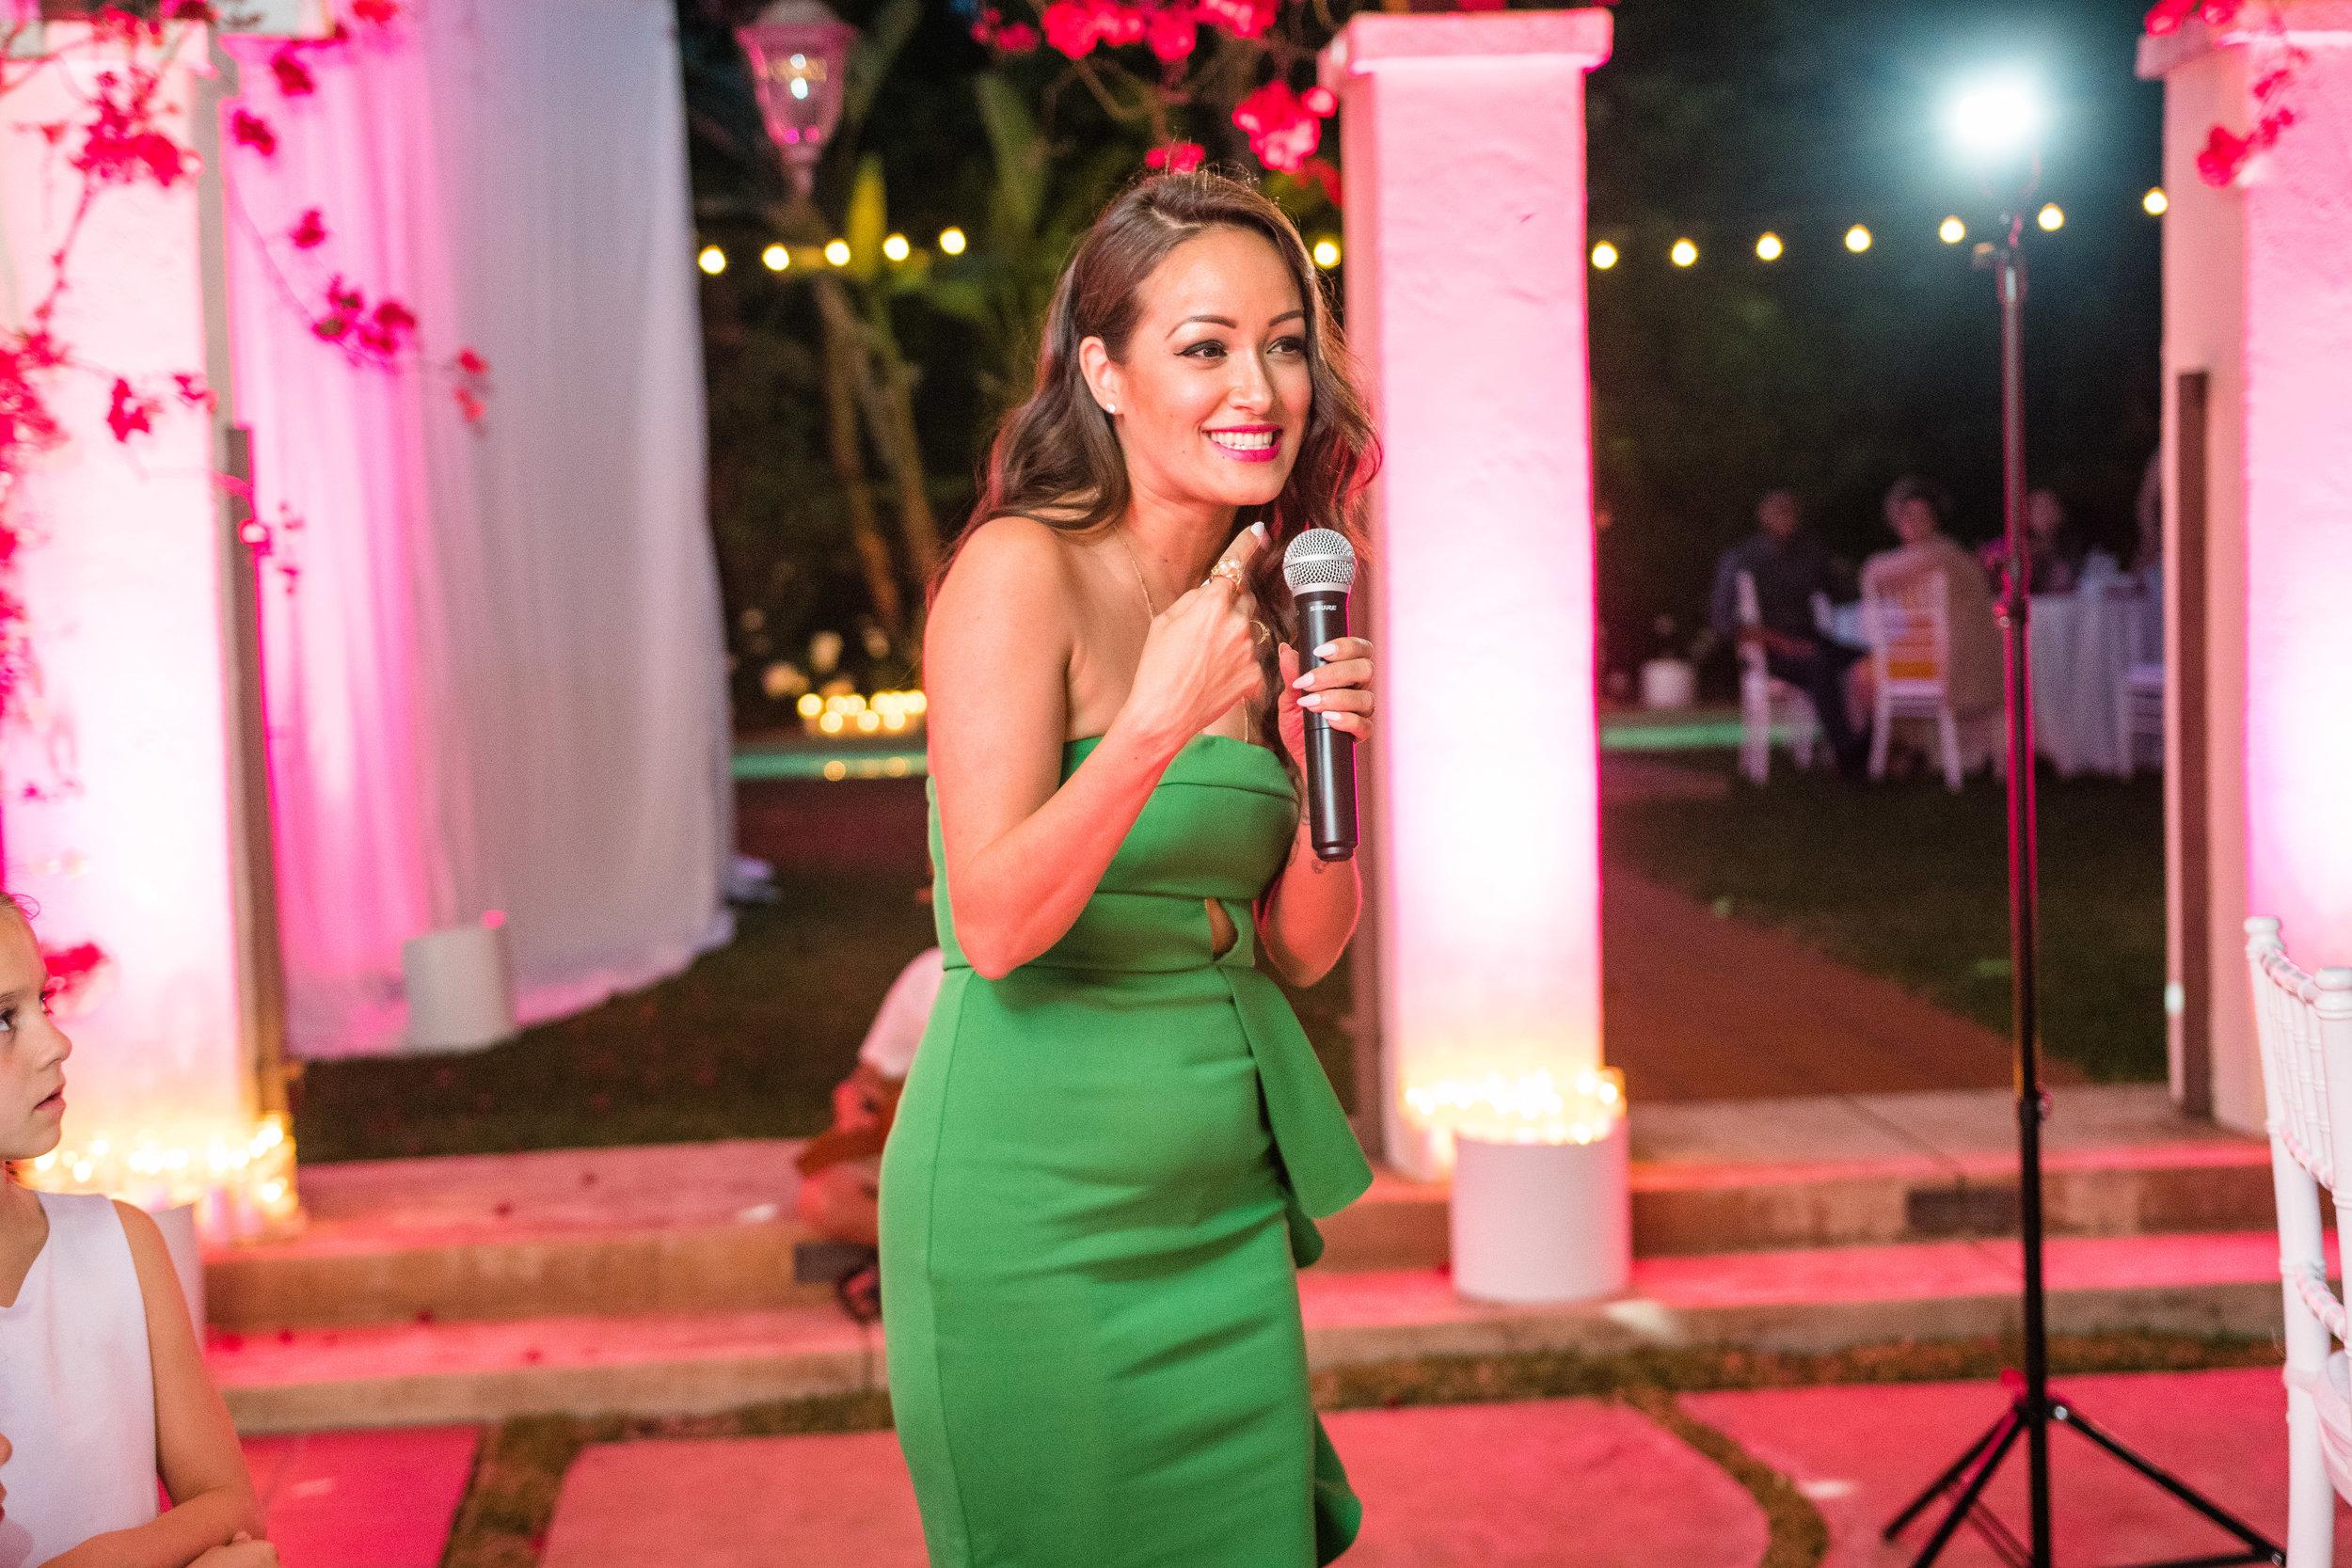 Vibrant Fiesta Backyard Wedding Reception matron of honor making a toast.jpg